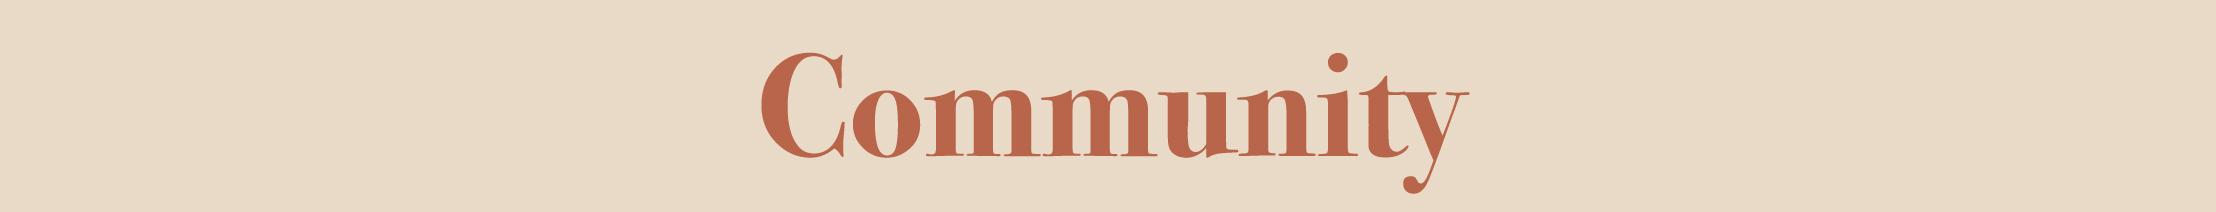 MMI19-Community.jpg